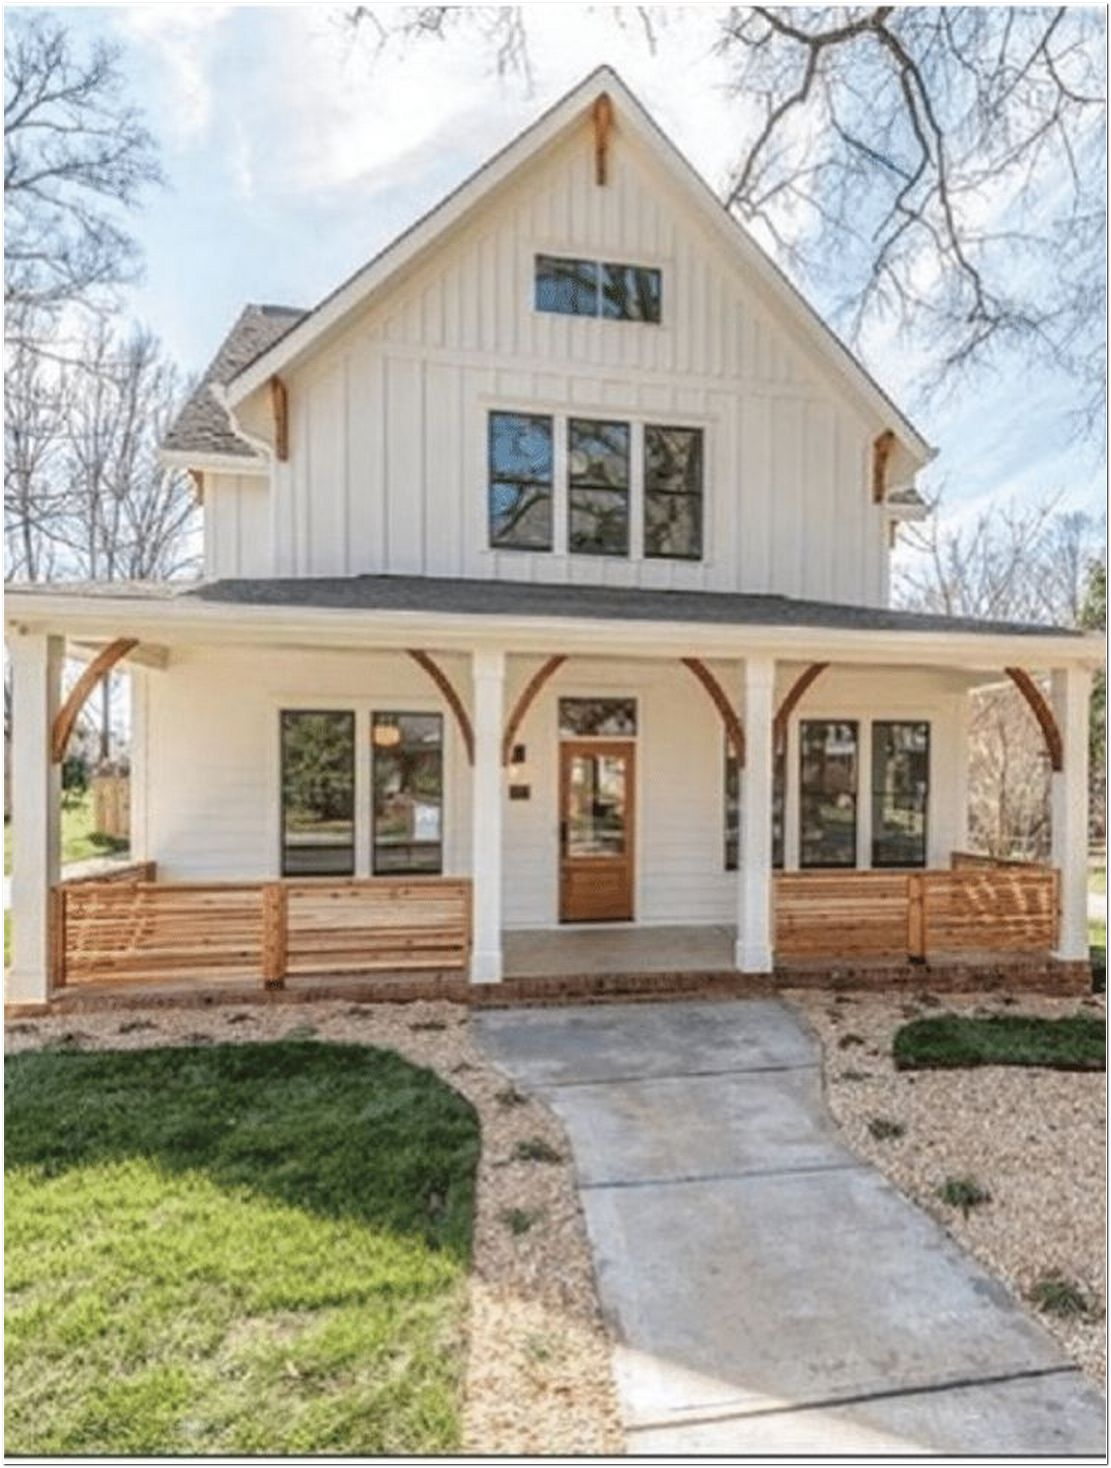 4 Joanna Gaines Inspired Homes Feeling Of Modern Farmhouse 56